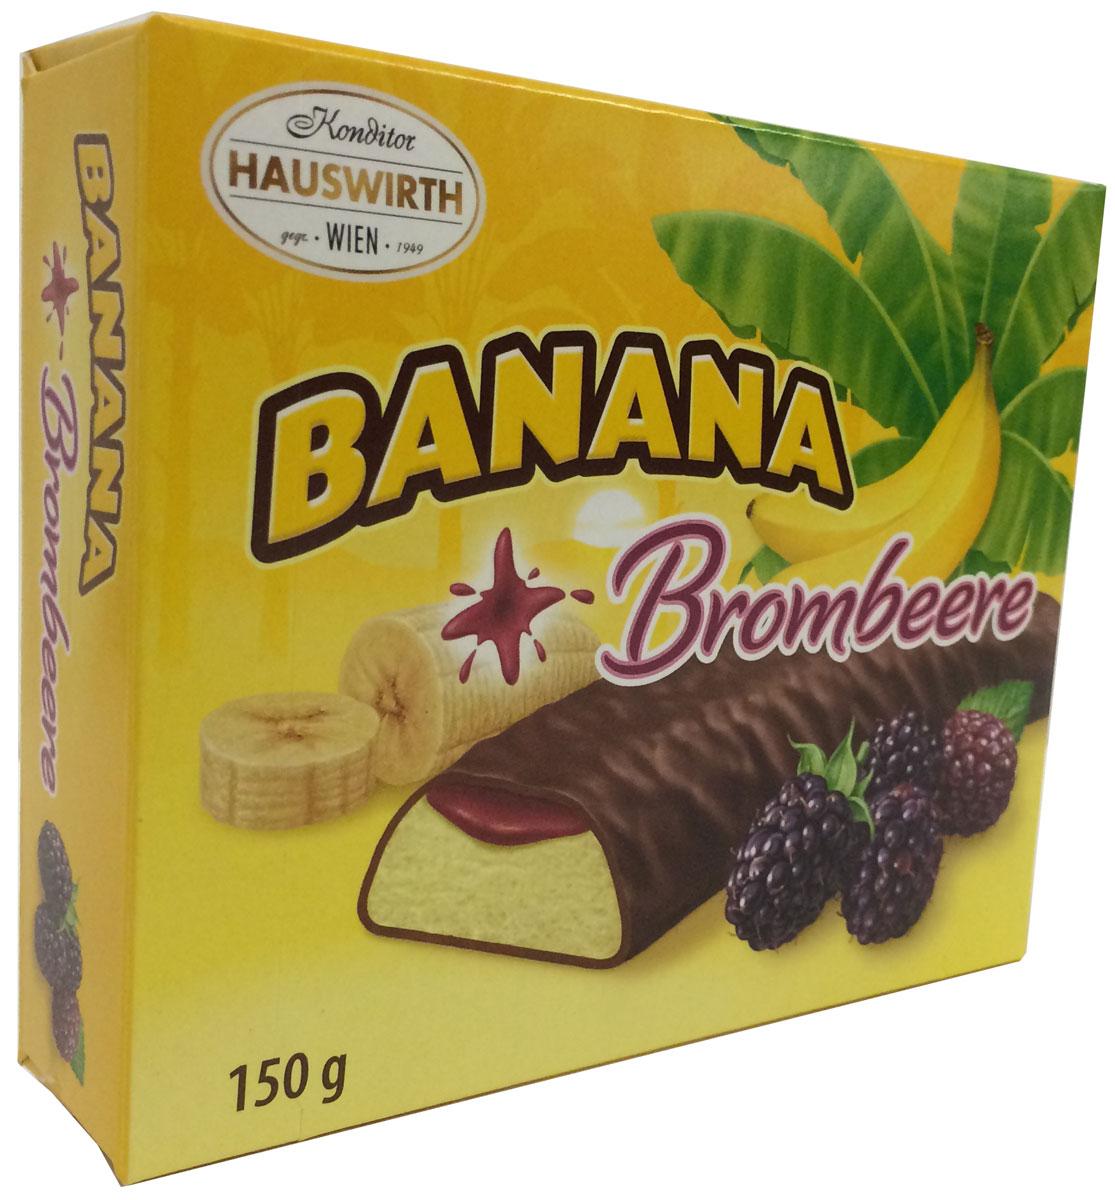 Hauswirth Банановое суфле с ежевичным джемом в темном шоколаде, 150 г9001395713019Банановое суфле с ежевичным джемом в темном шоколаде.